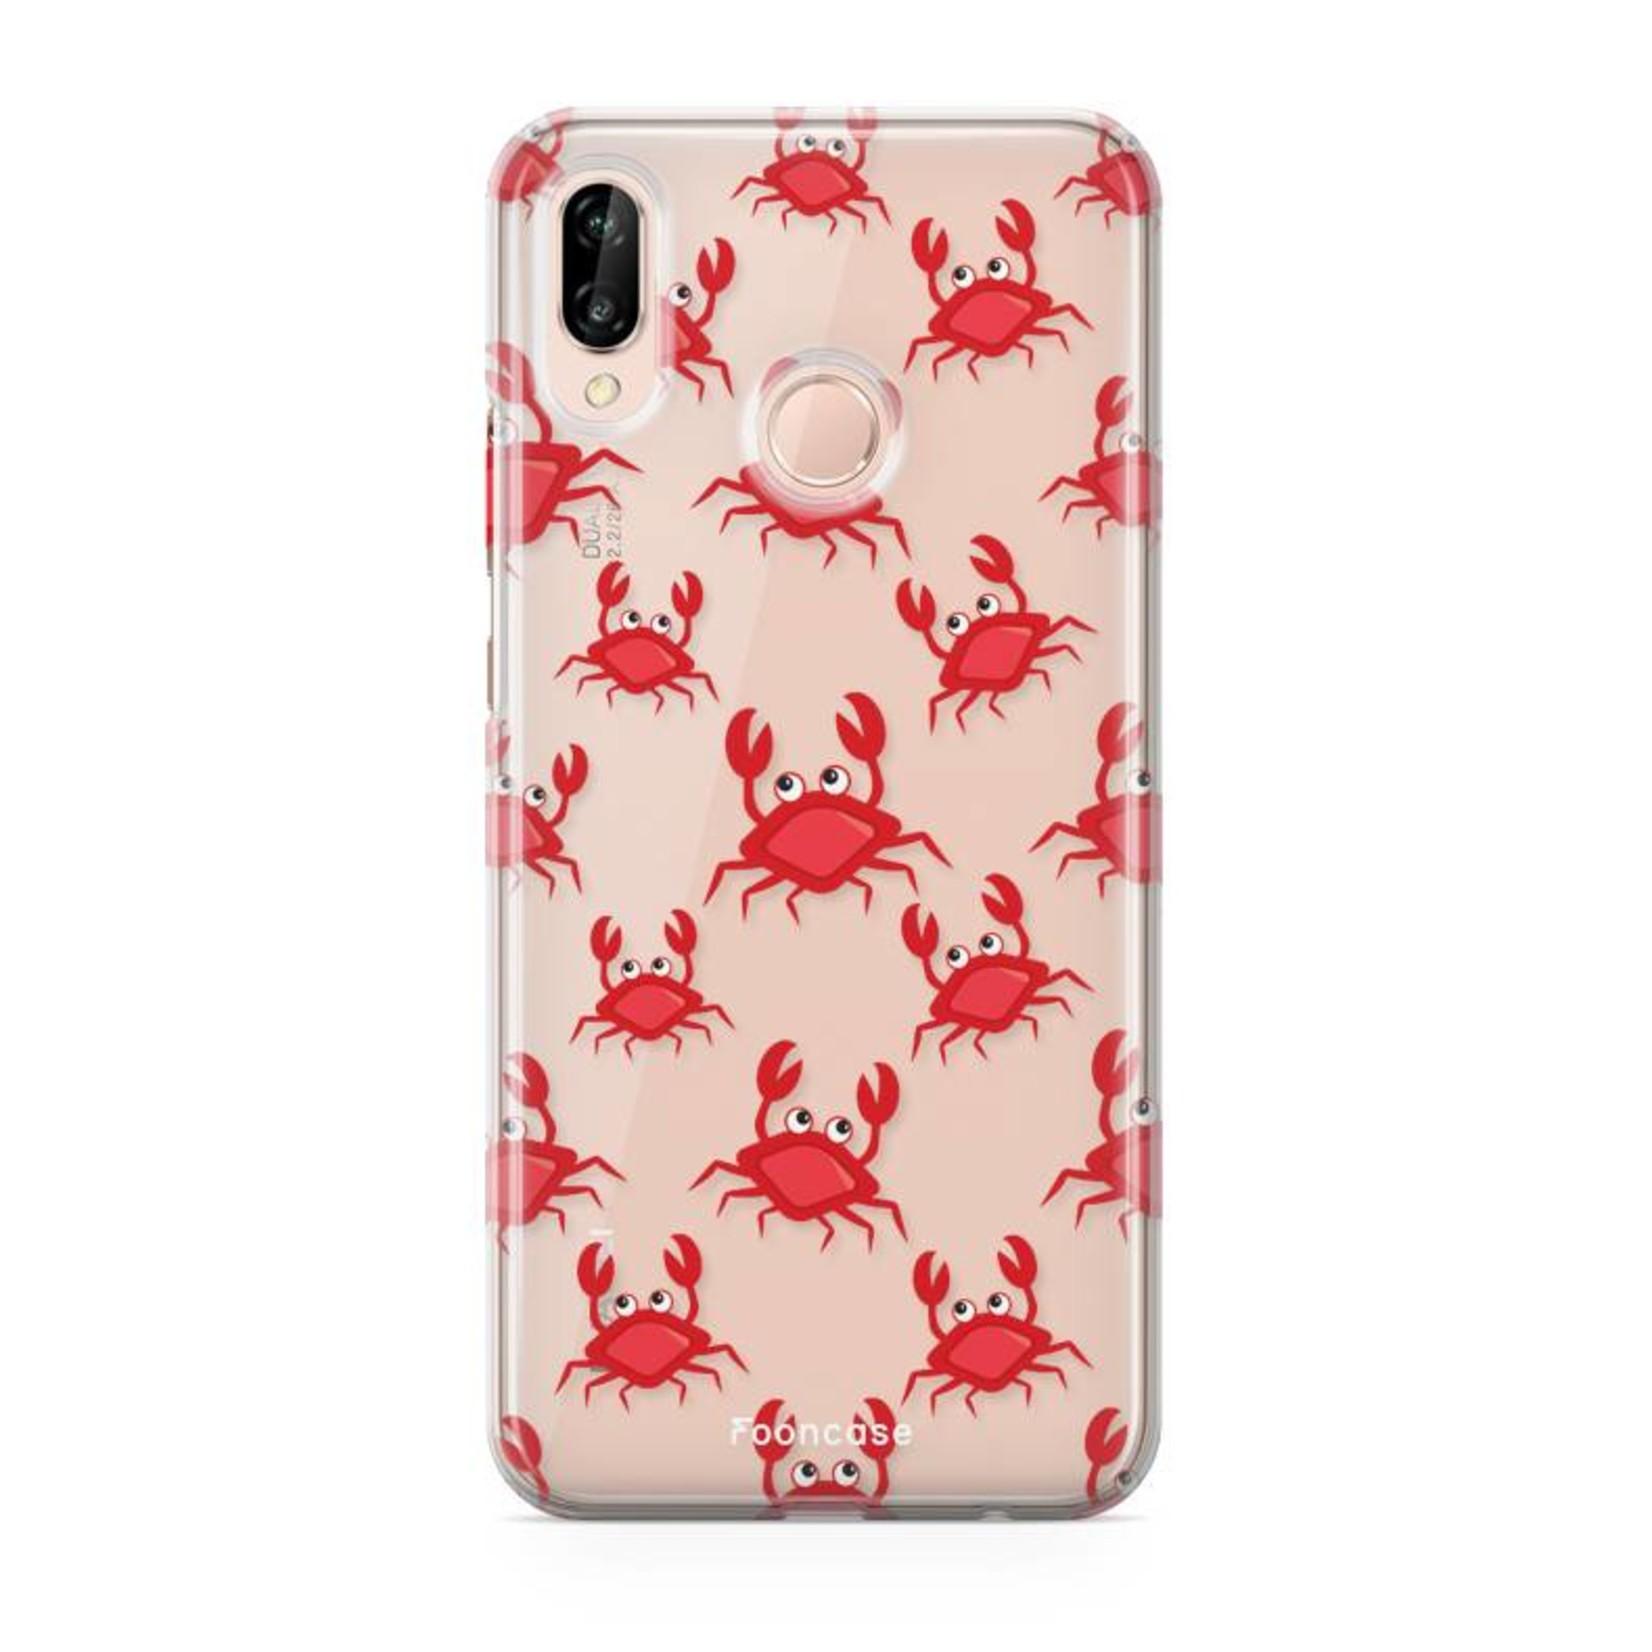 FOONCASE Huawei P20 Lite Handyhülle - Krabben